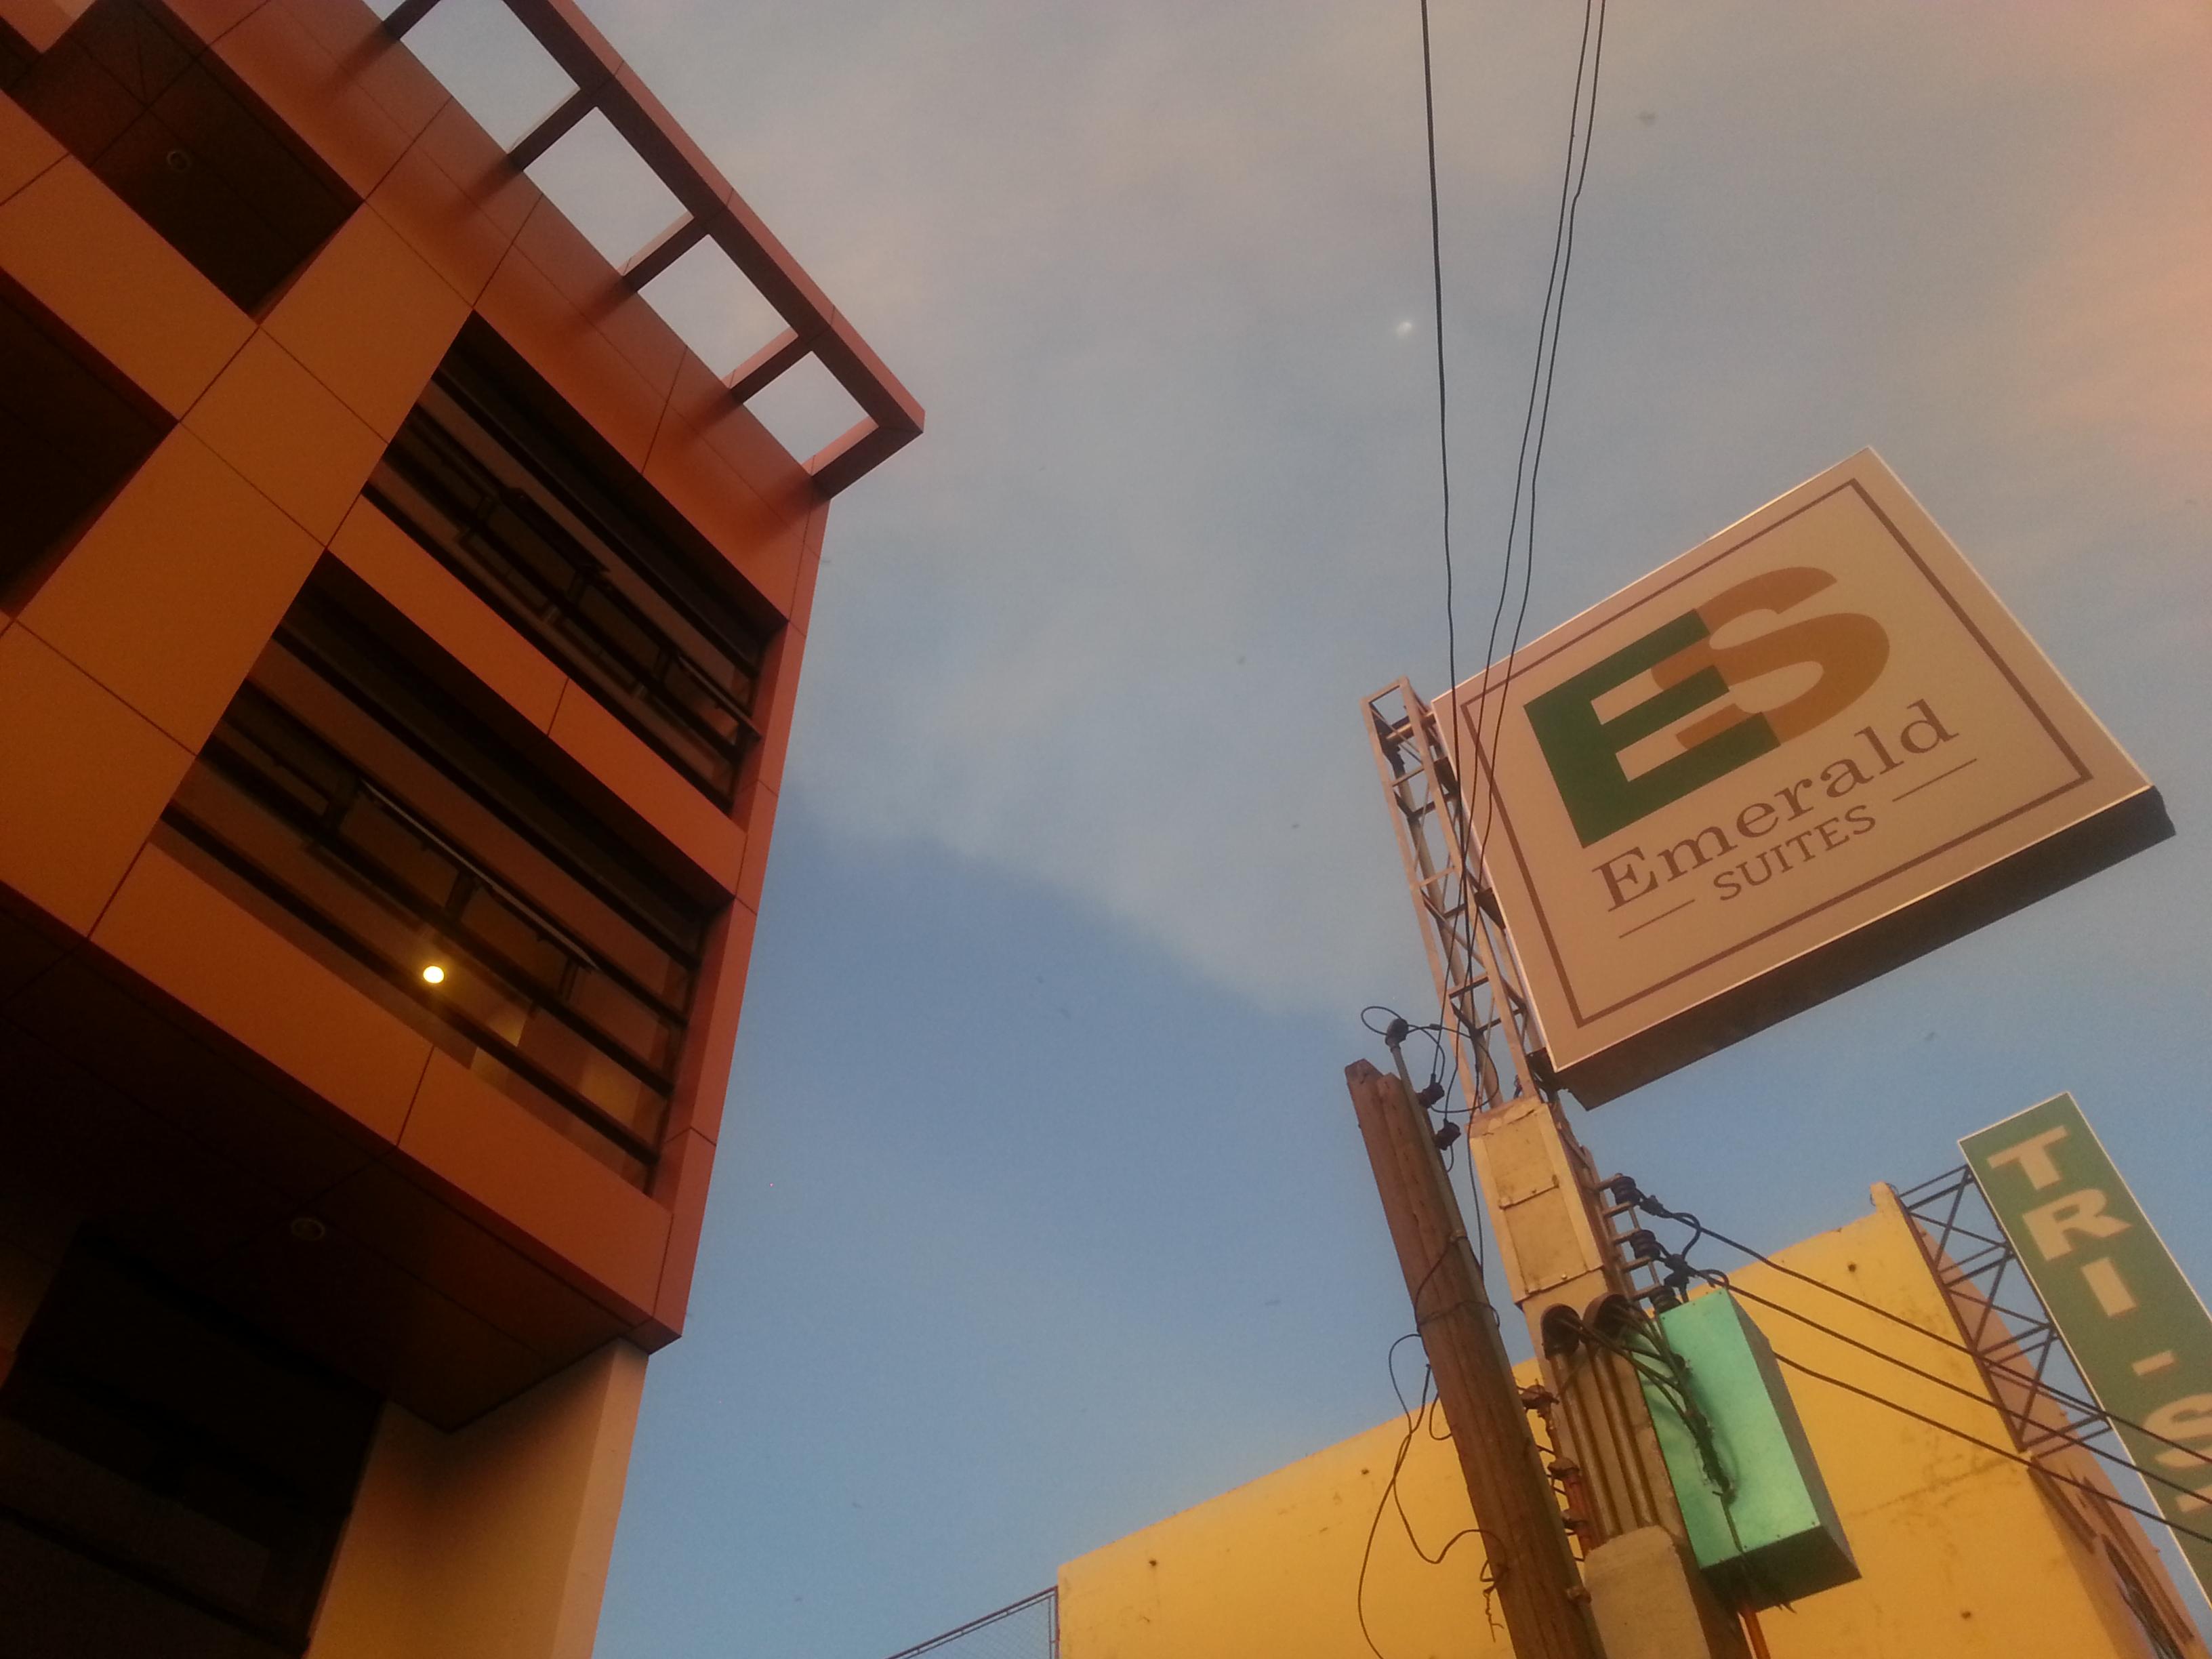 Emerald Suites – Budget friendly hotel in CDO